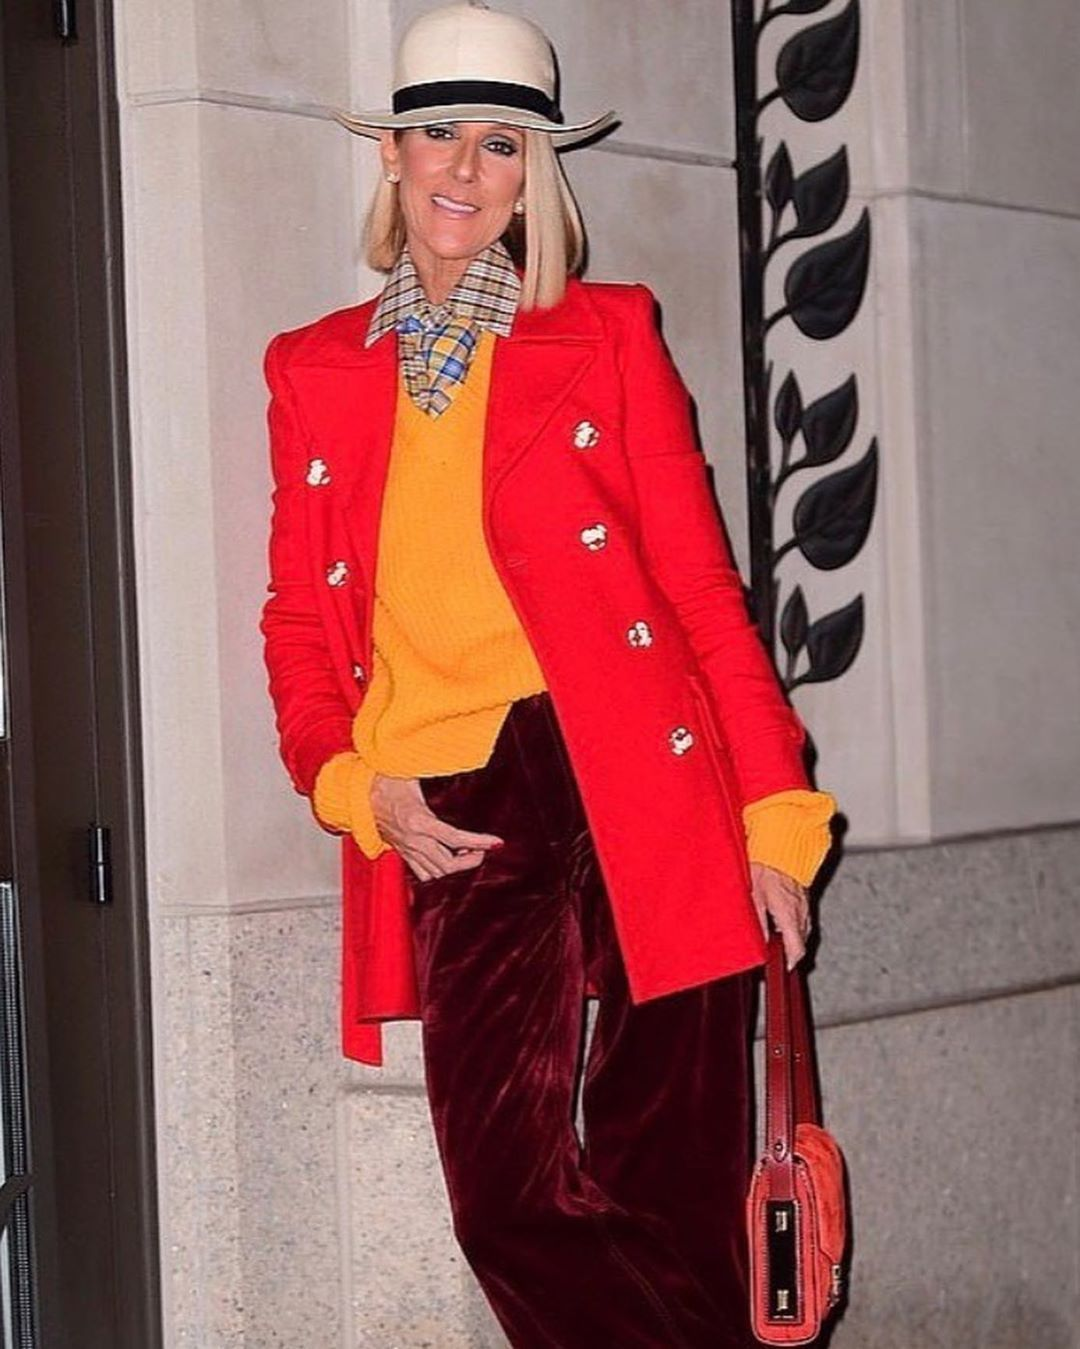 Pin by Nikki Denney on Celine Dion | Celine fashion